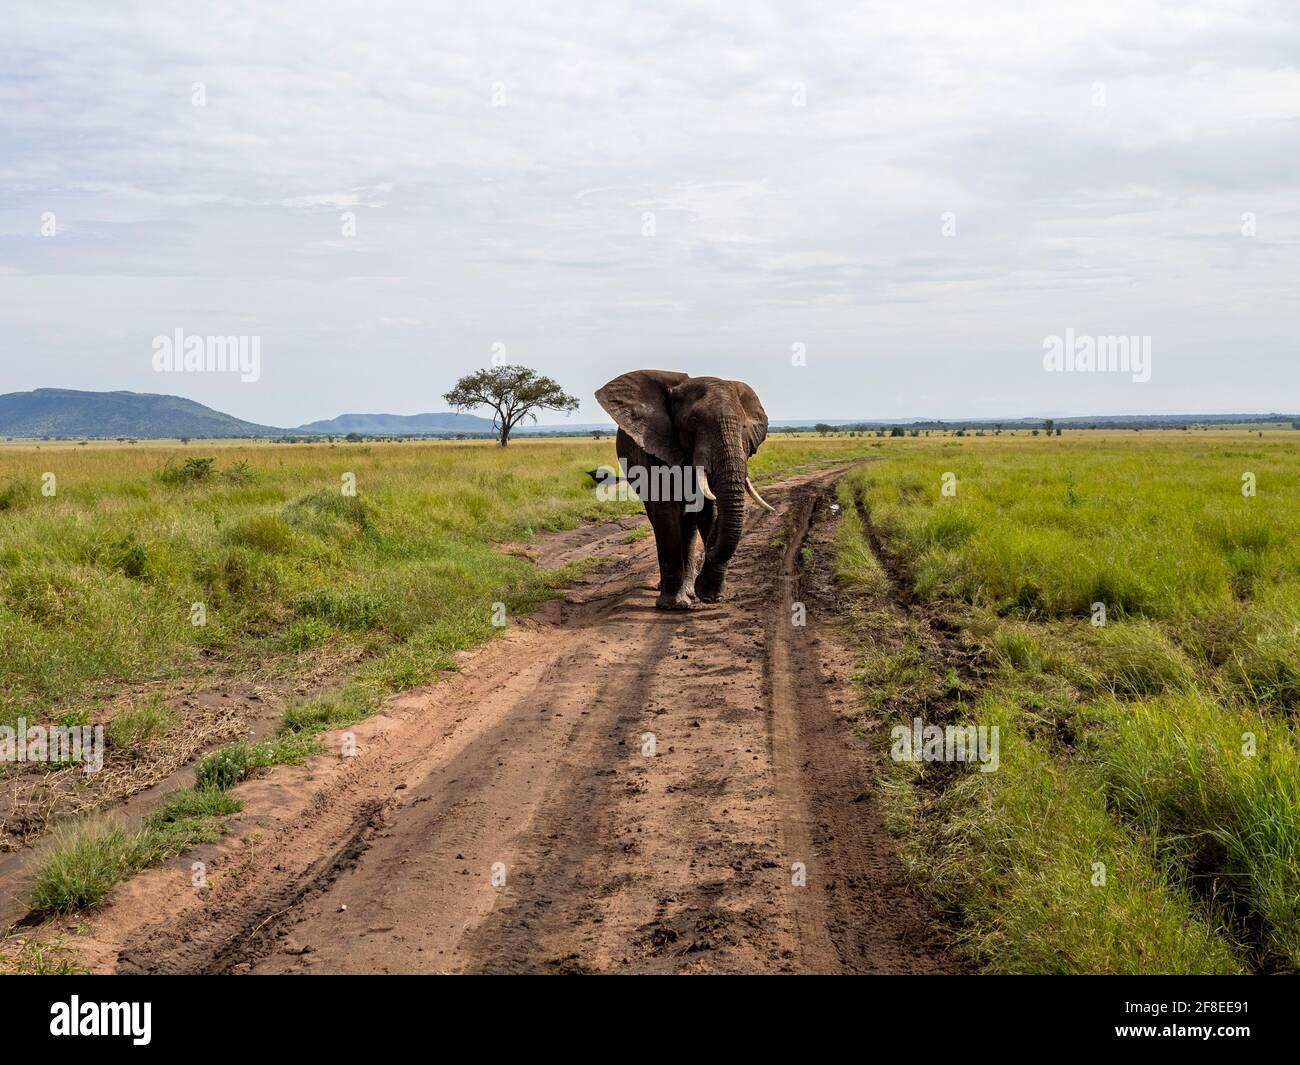 Serengeti-Nationalpark, Tansania, Afrika - 29. Februar 2020: Afrikanischer Elefant auf dem Feldweg des Serengeti-Nationalparks Stockfoto